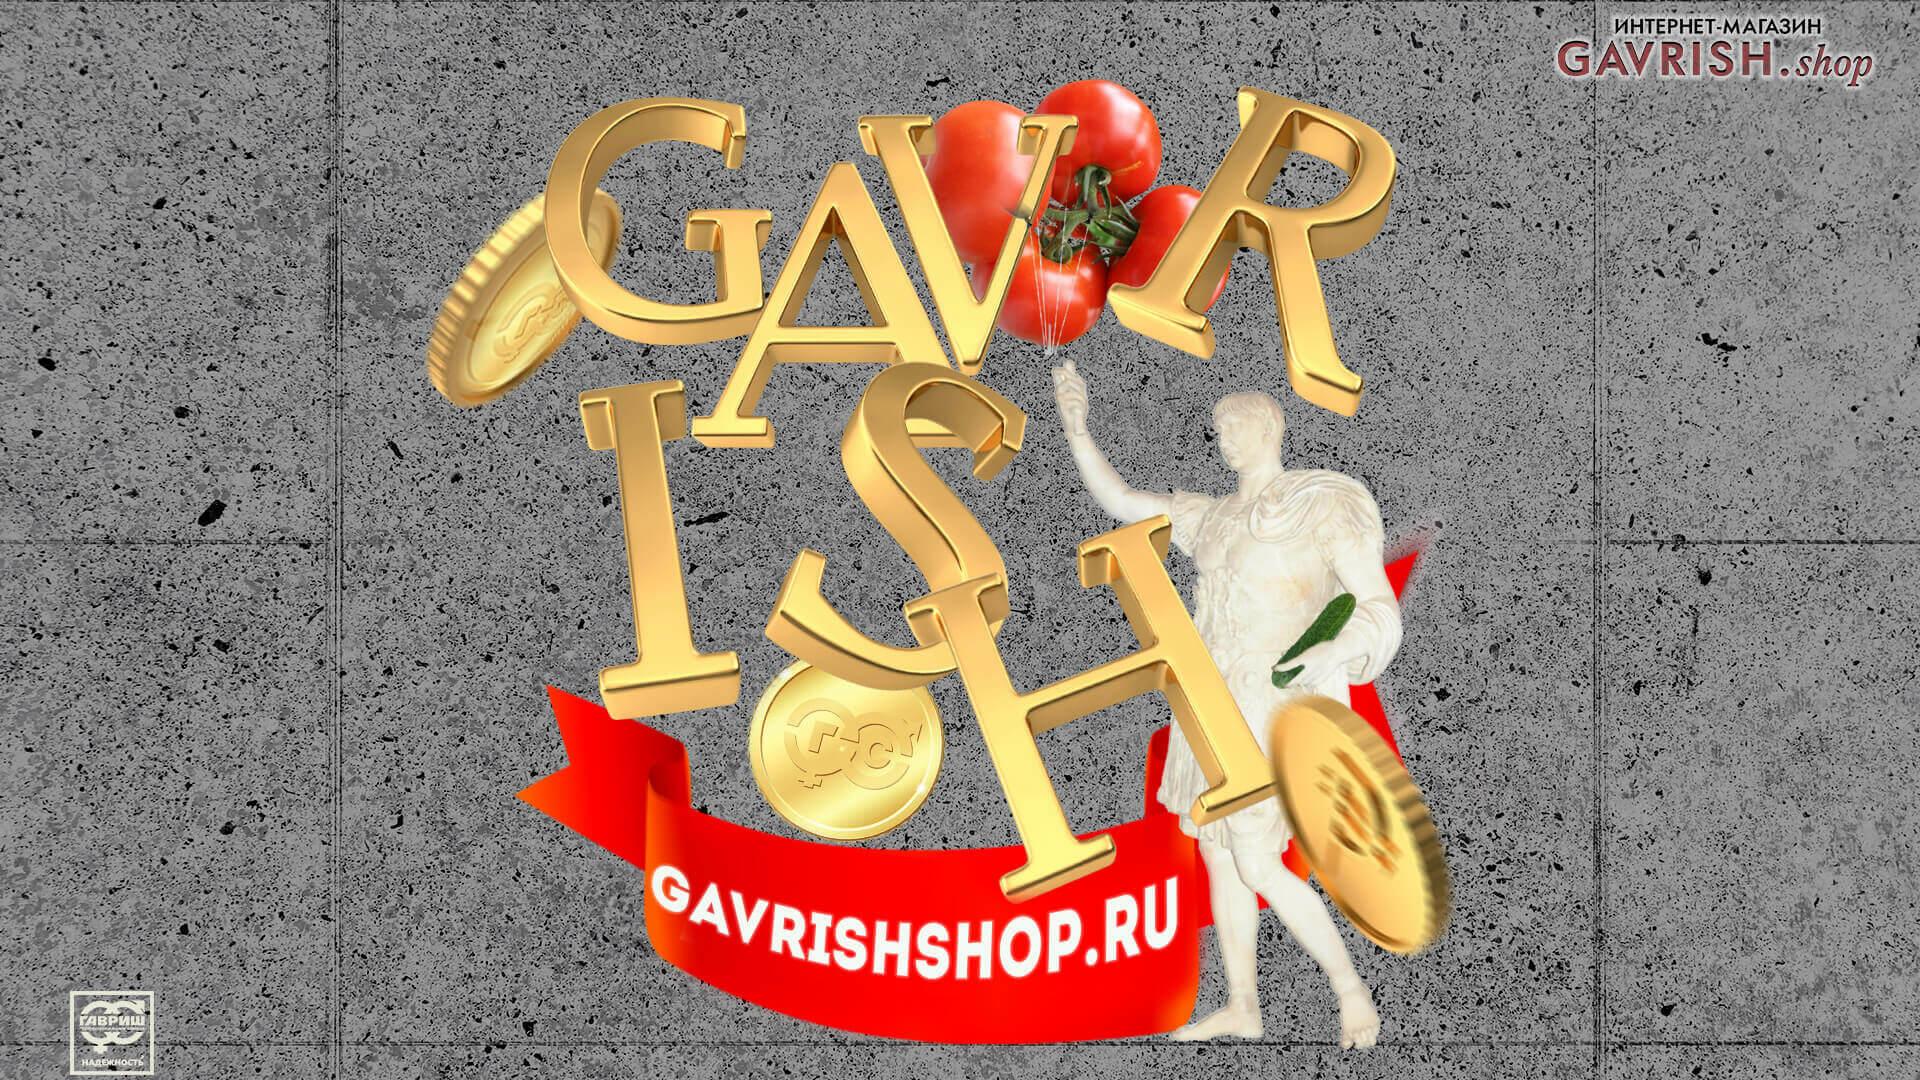 Салат Гавриш